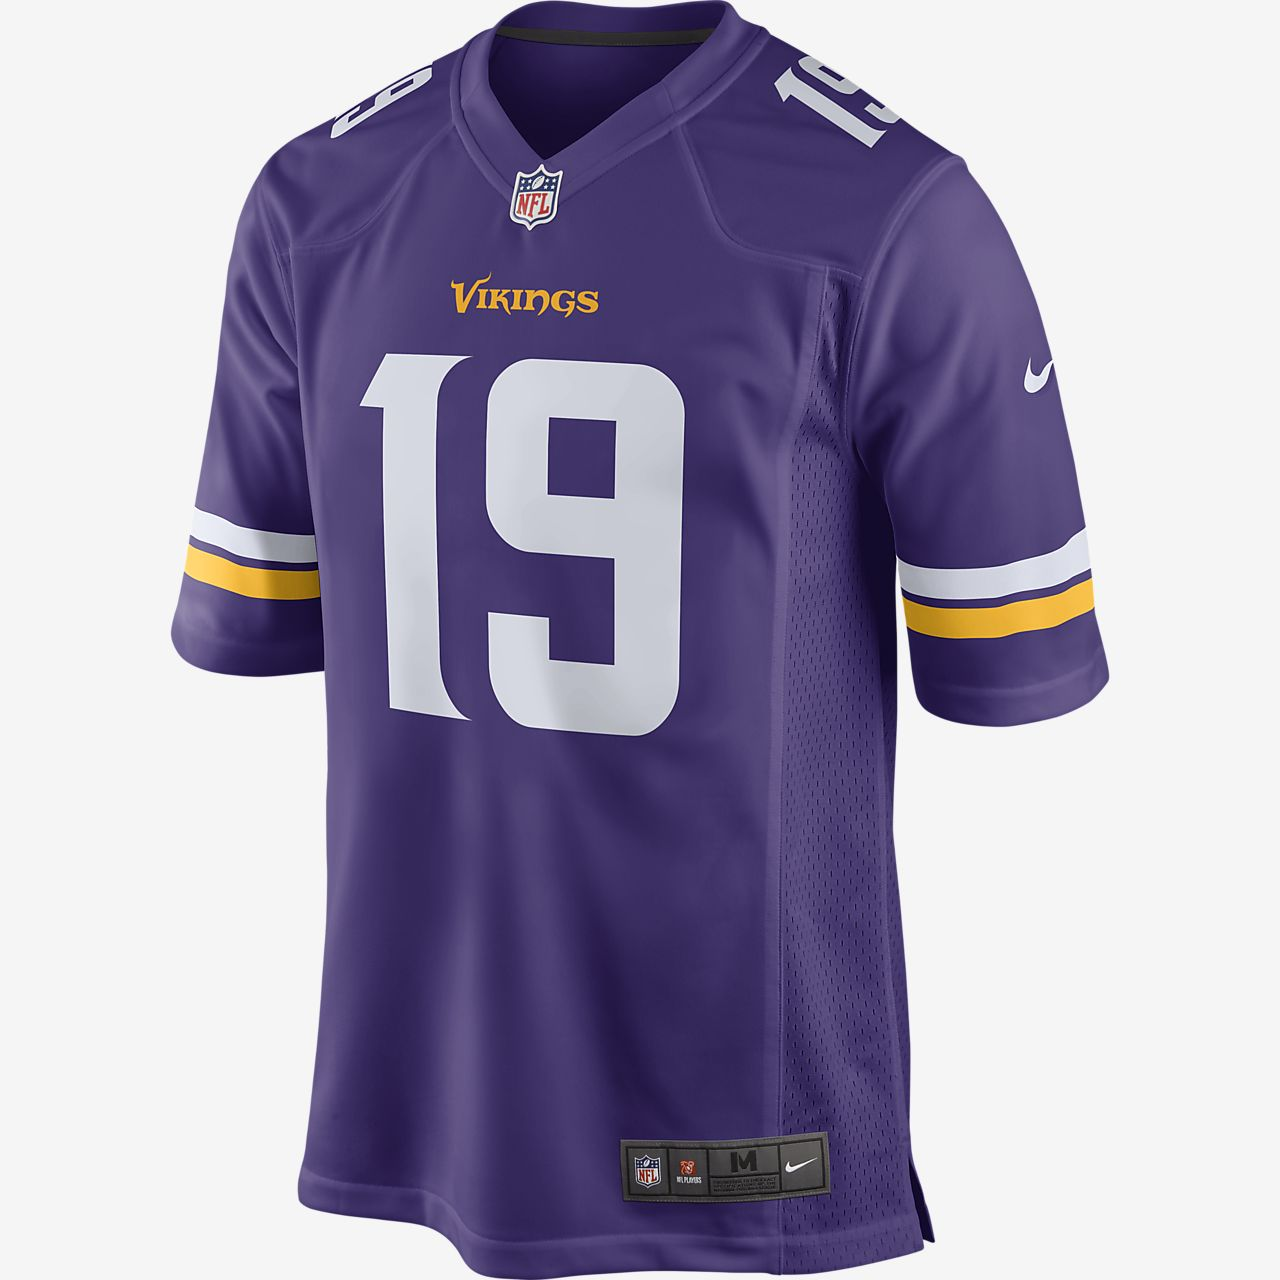 Maglia da football americano Minnesota Vikings Game (Adam Thielen) NFL - Uomo